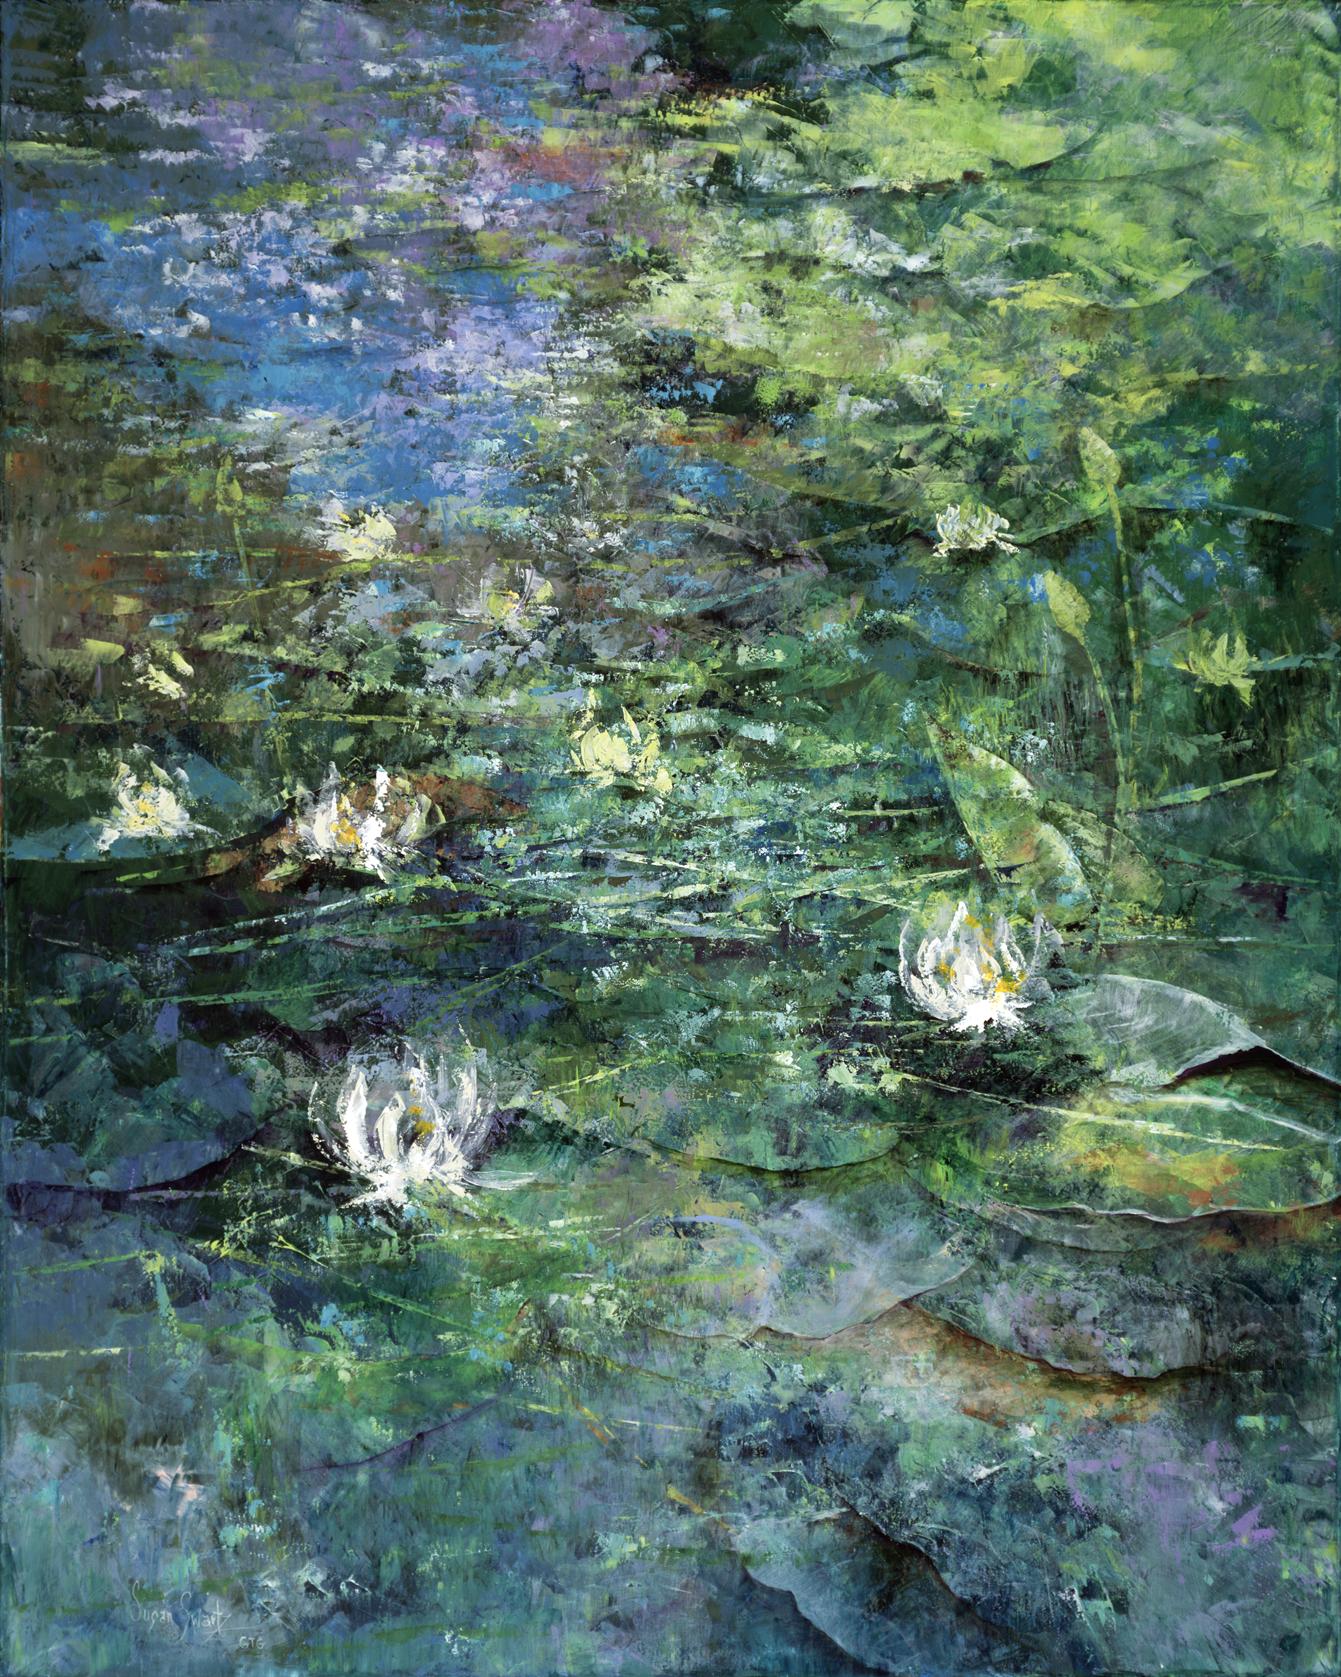 Iridescent Reflections 48 x 60